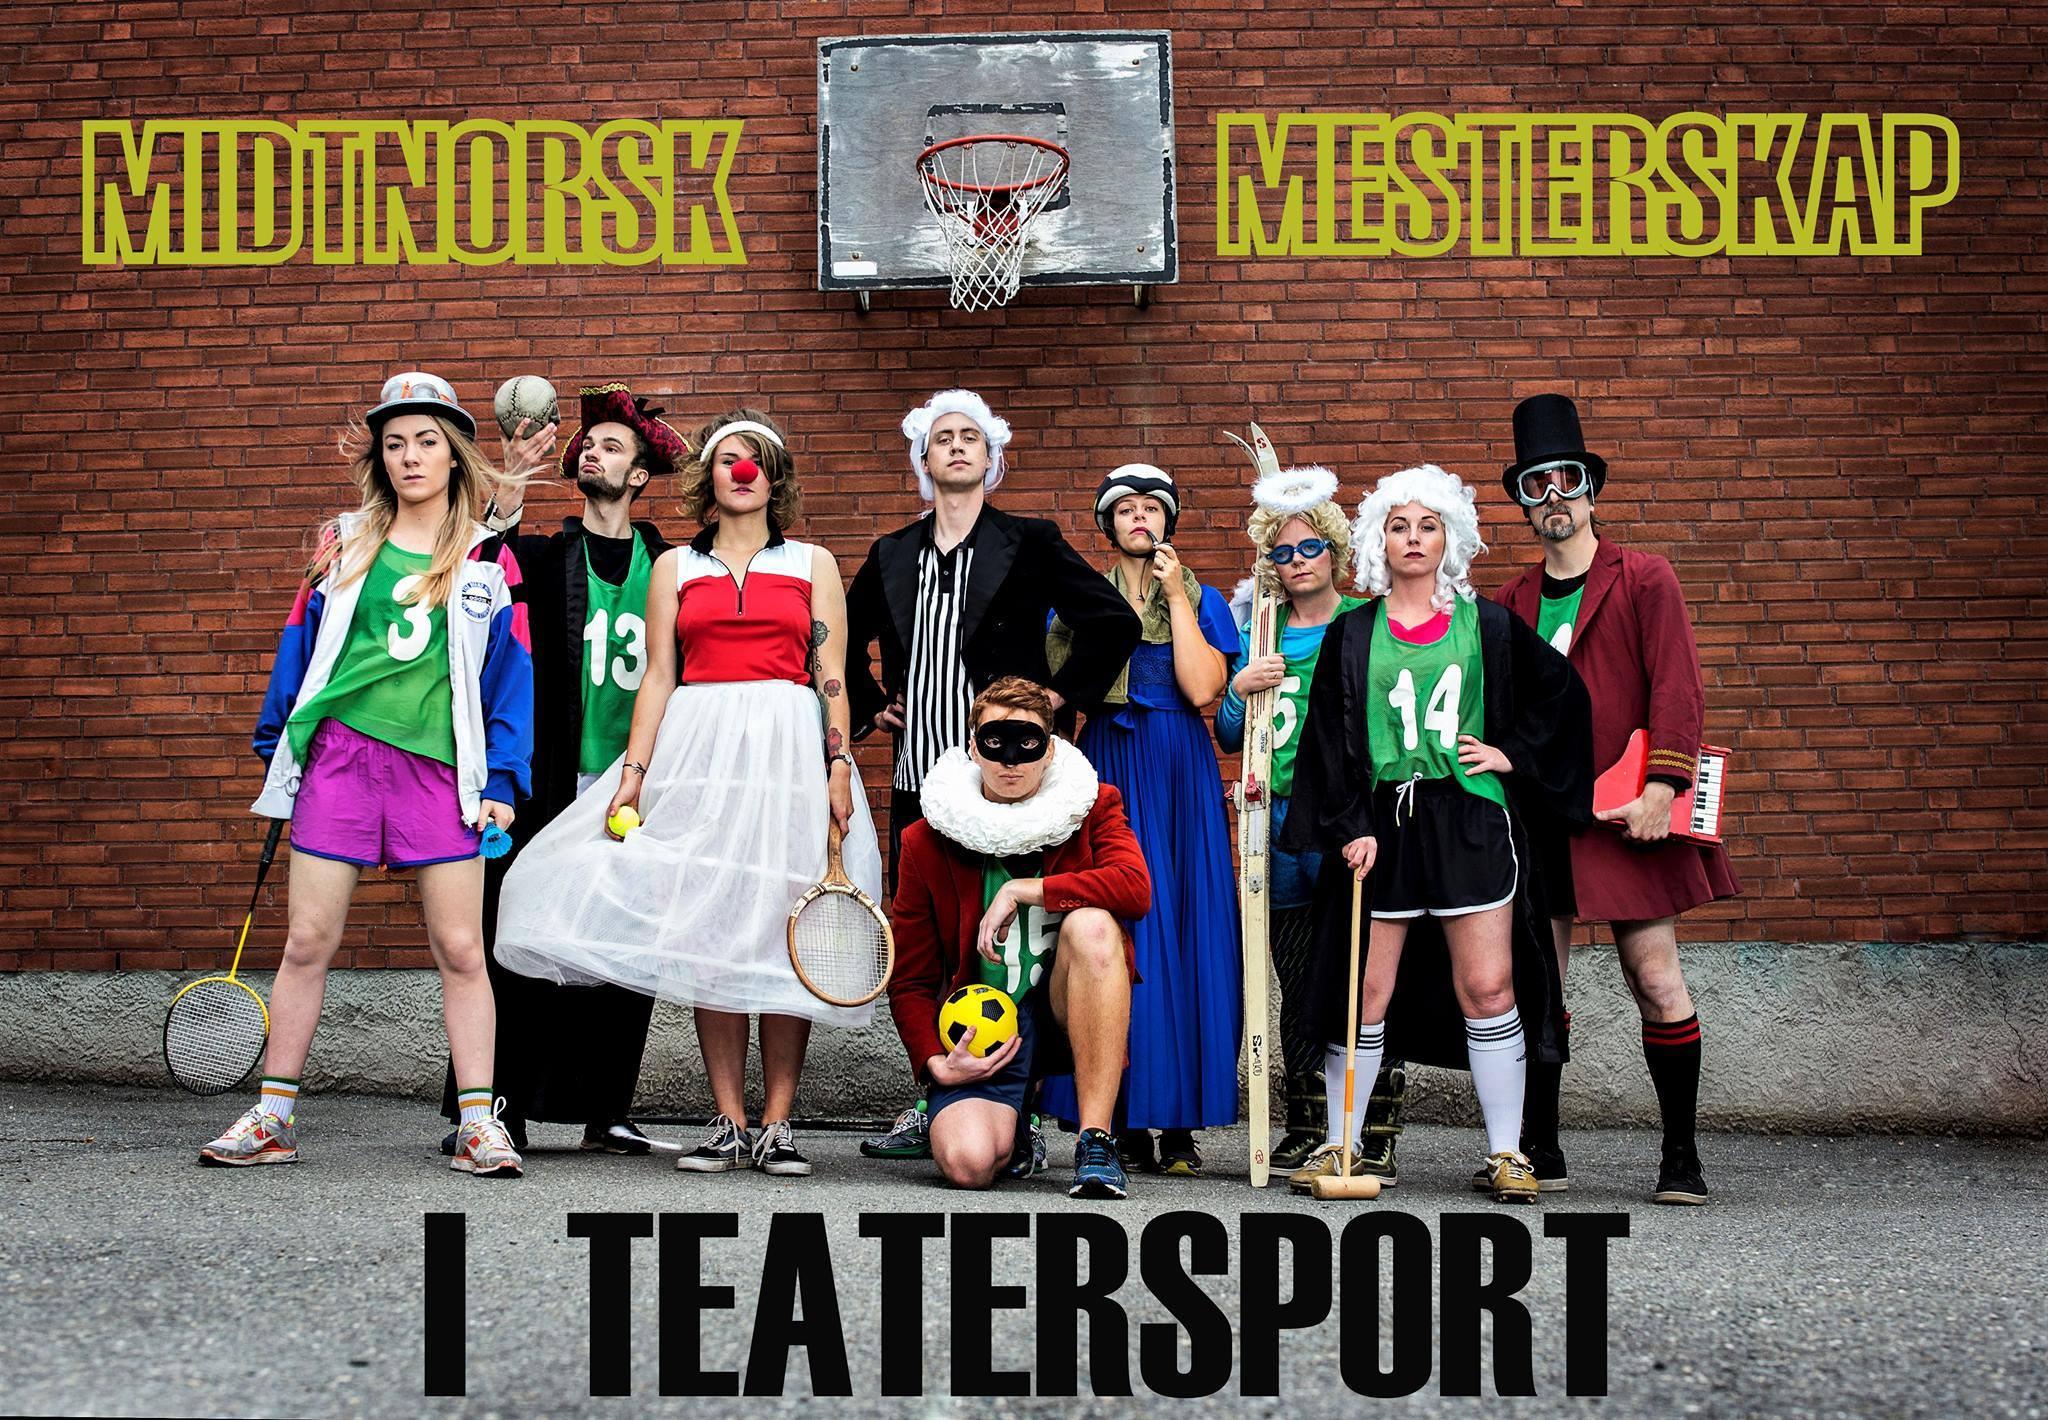 Midtnorsk Mesterskap i Teatersport™